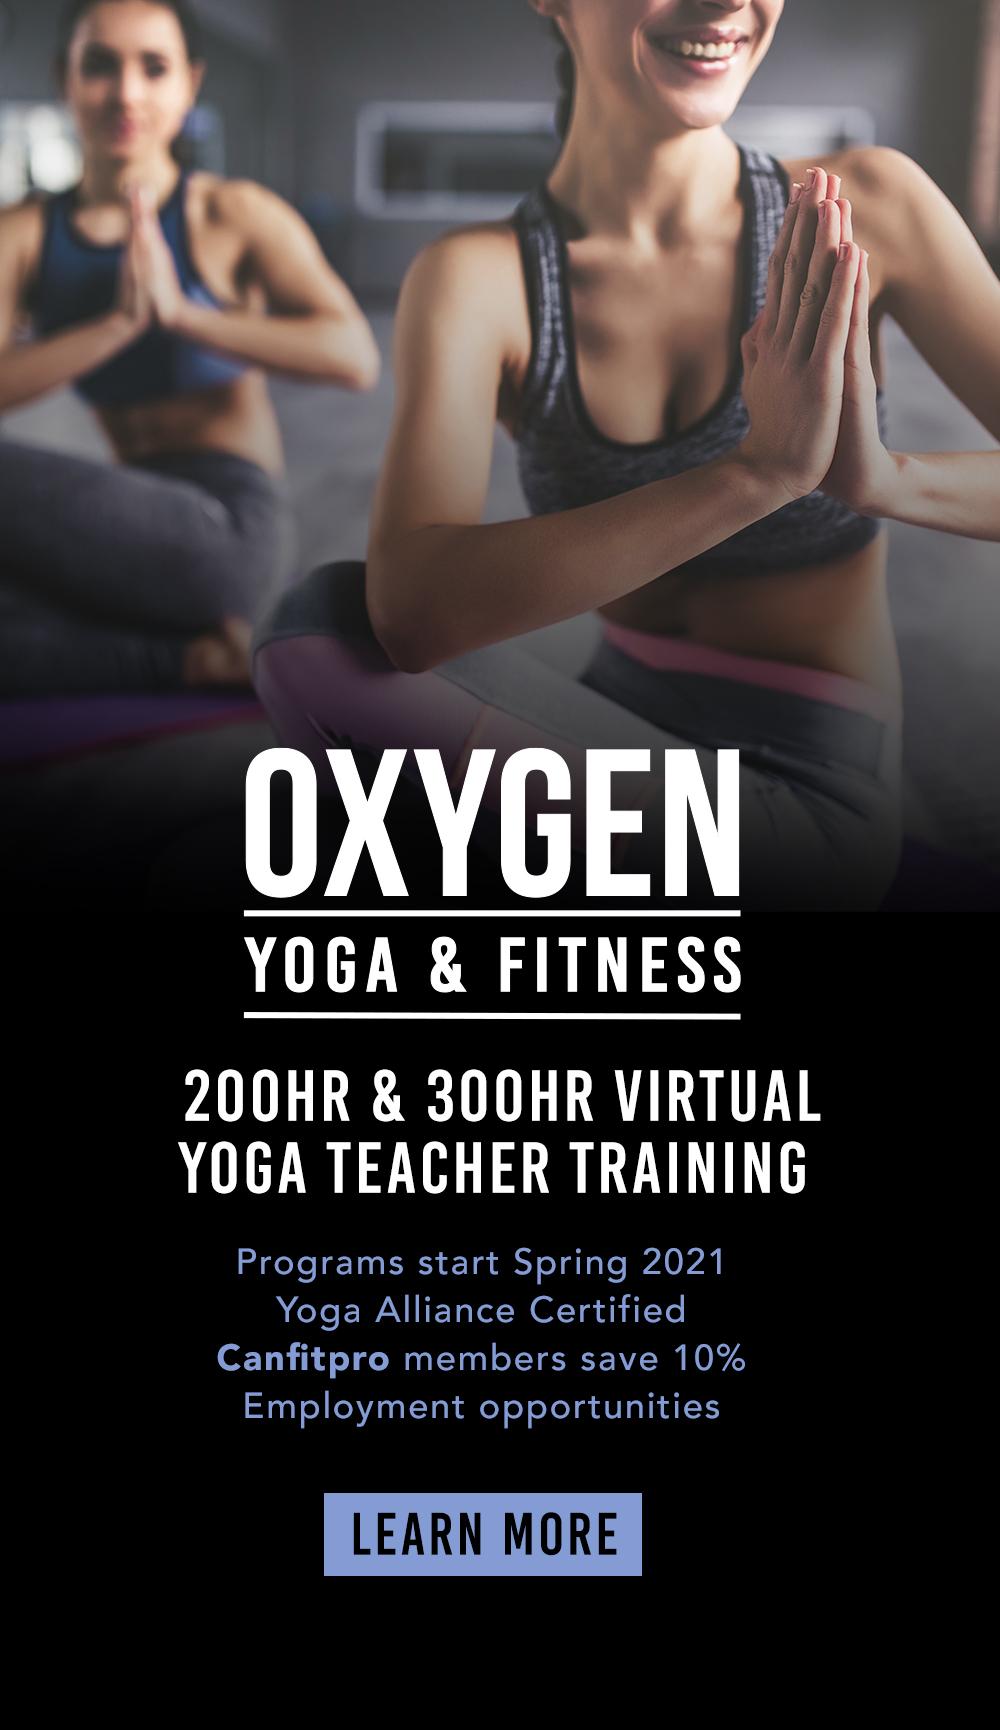 oxygen carousel banner